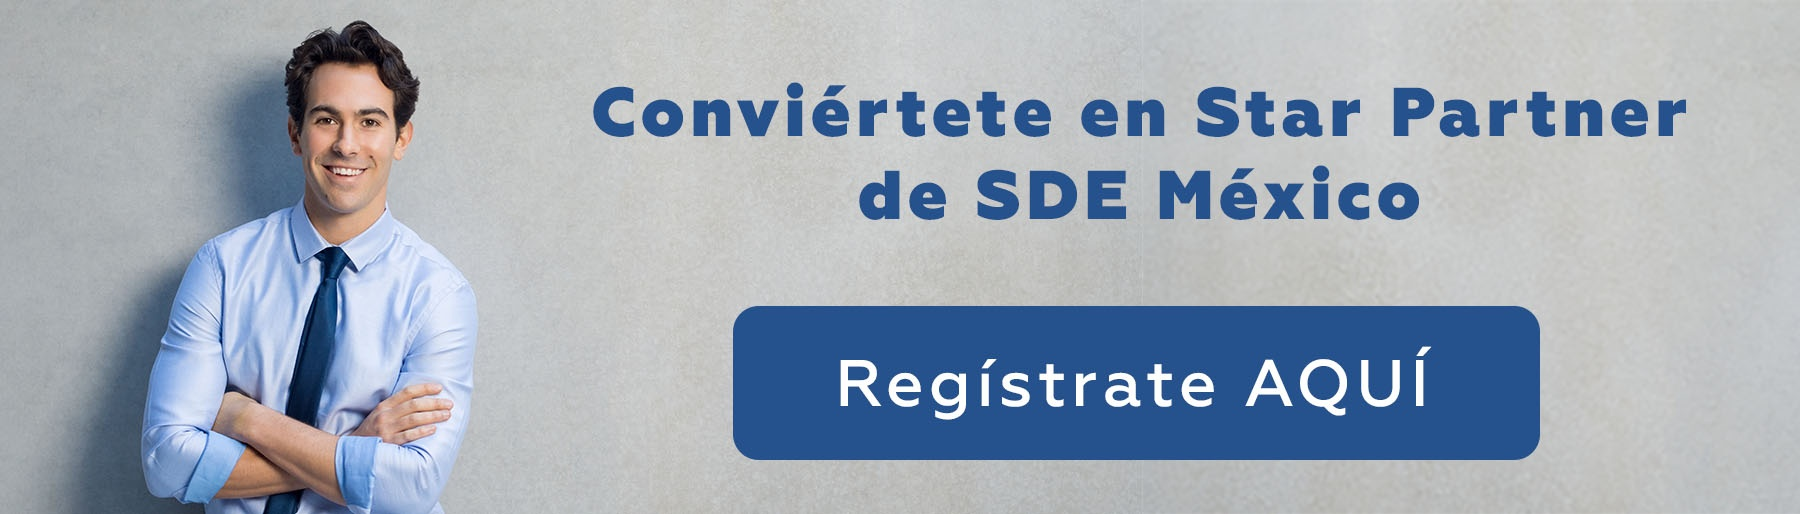 Conviértete en Star Partner de SDE México.